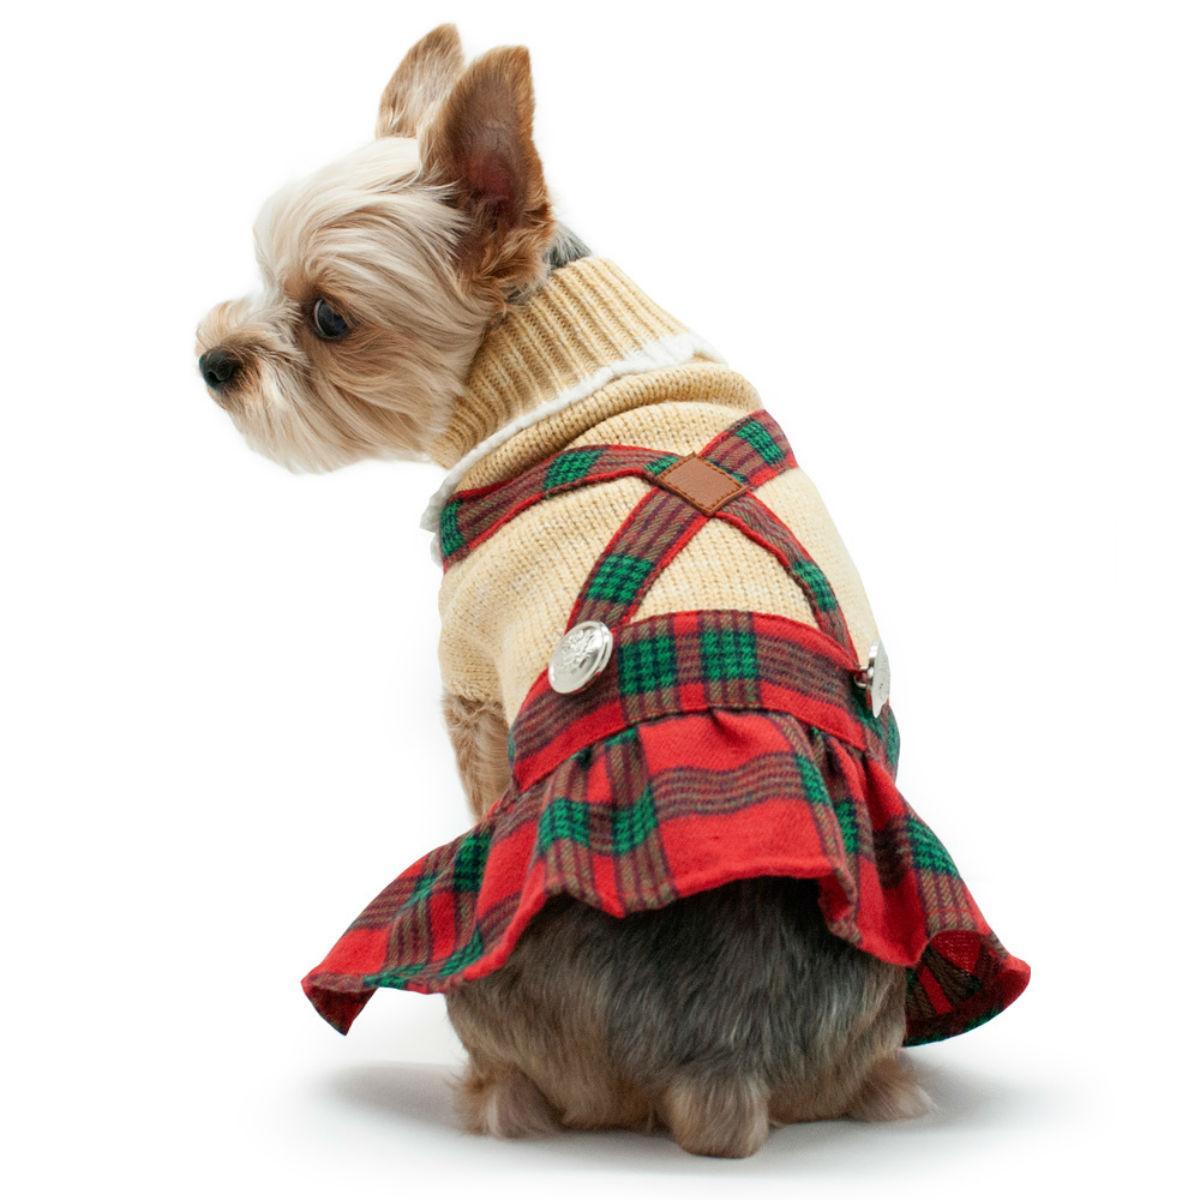 Holiday Plaid Dog Sweater Dress by Dogo